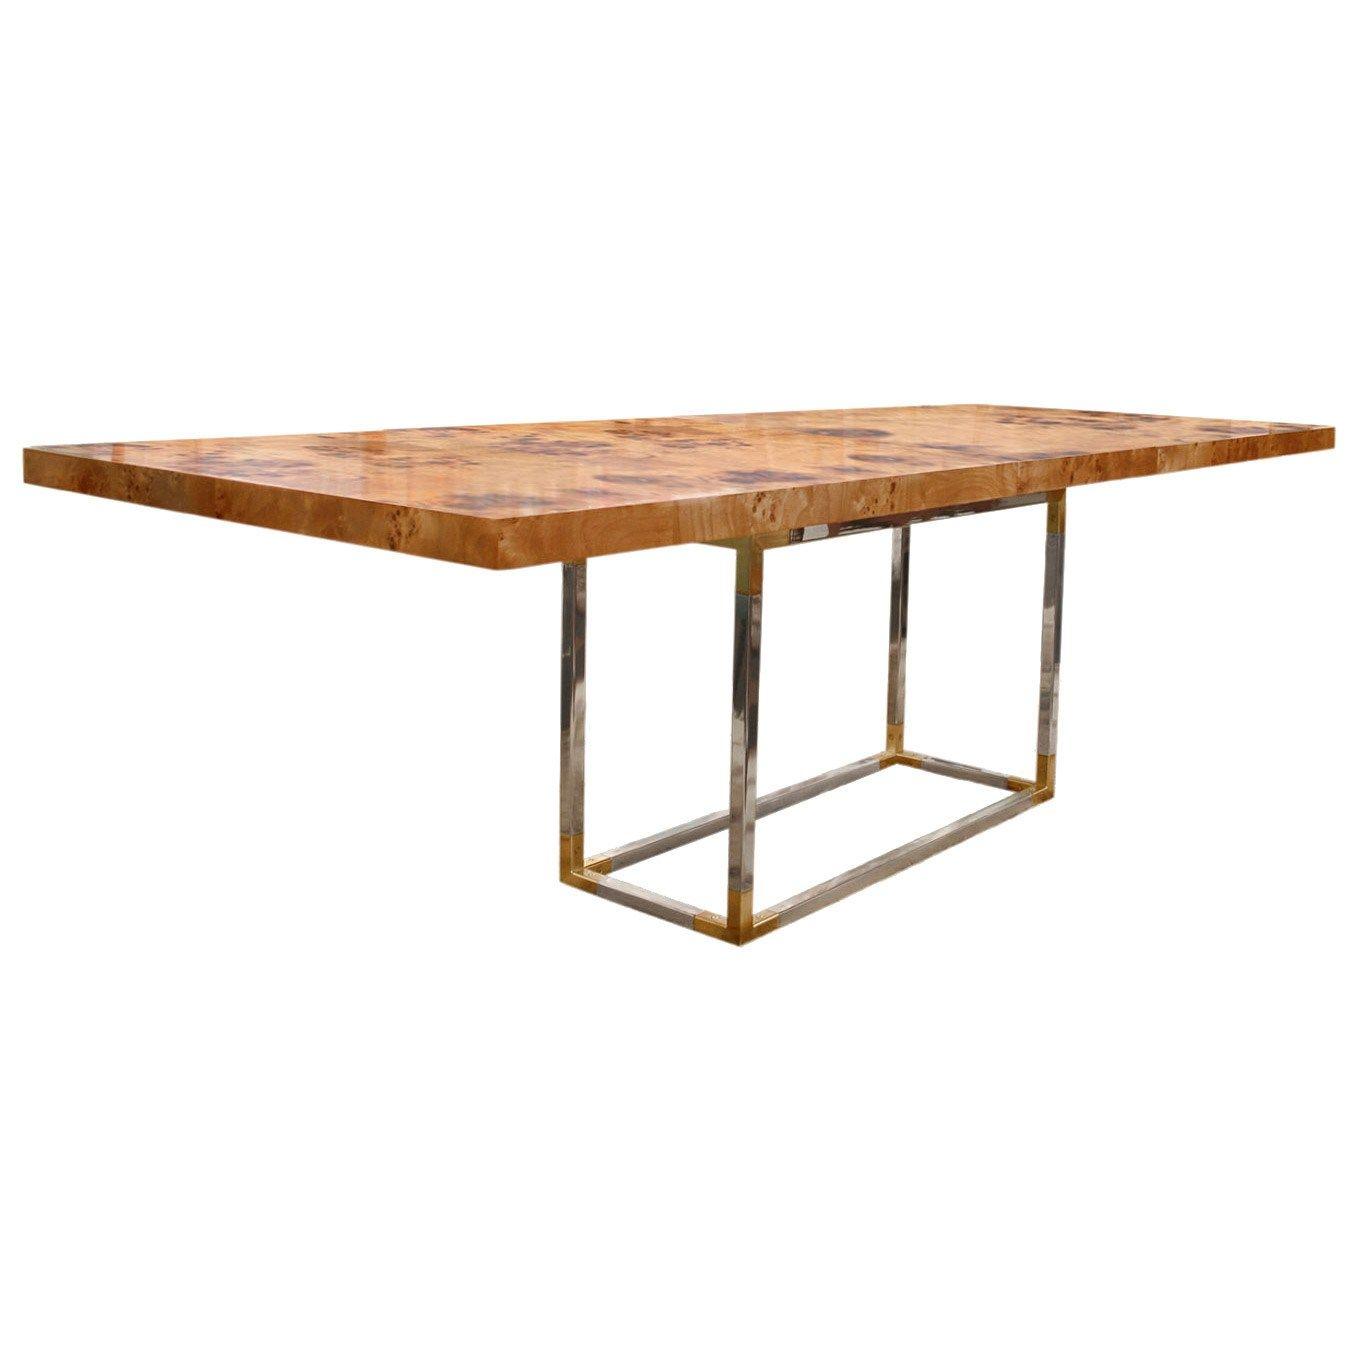 Jonathan Adler Bond Dining Table Dining Table In Kitchen Dining Table Extendable Dining Table